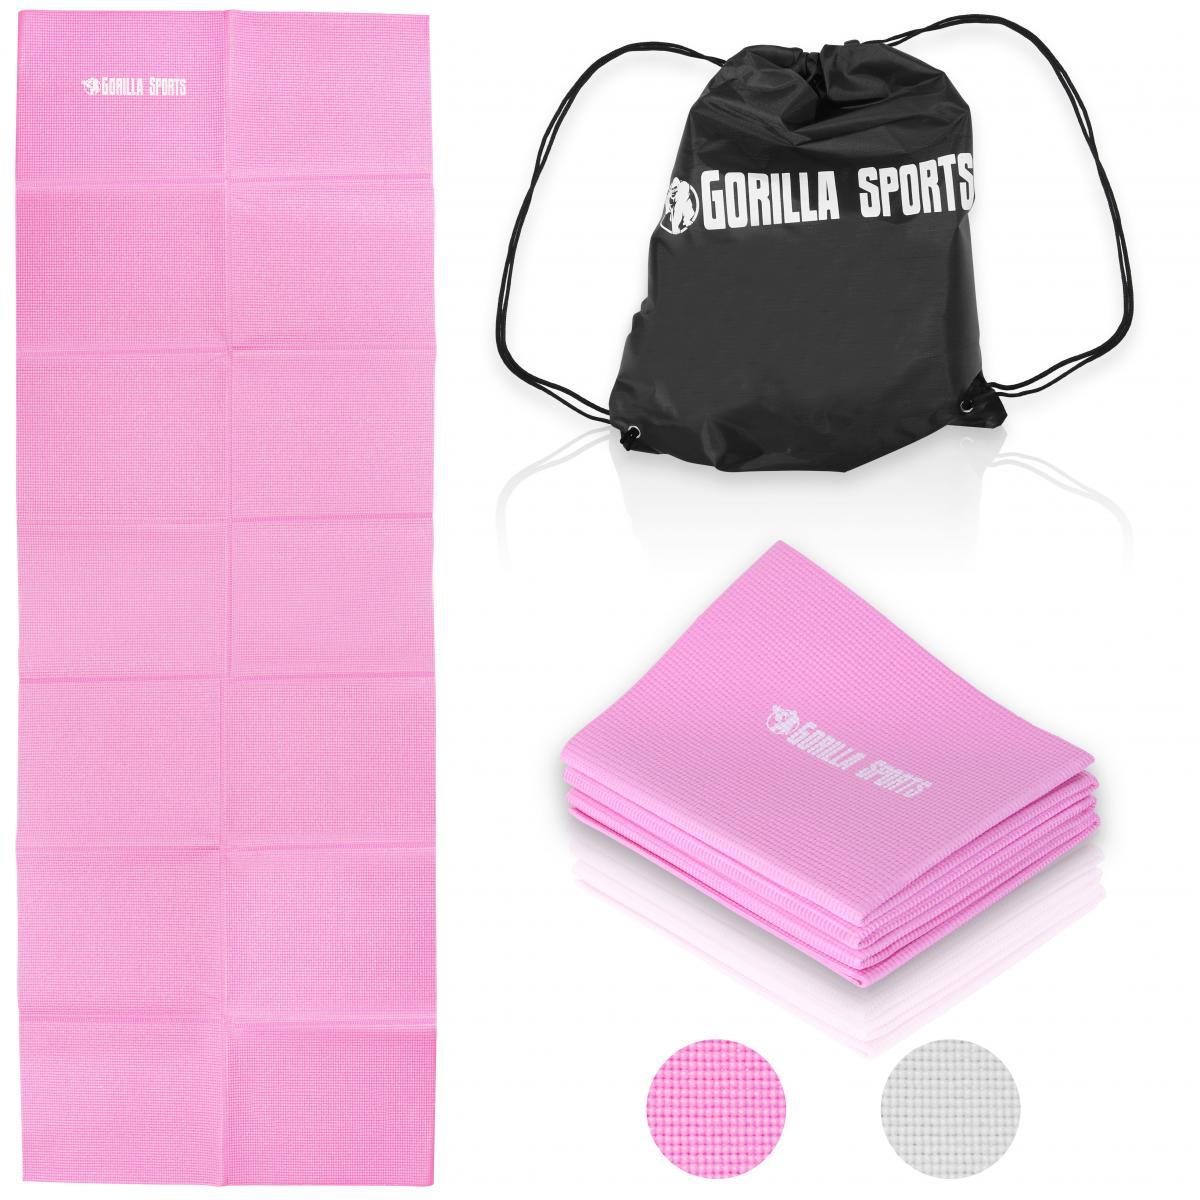 Gorilla Sports Yogamatte faltbar inkl. Beutel in Rosa 101117-00063-0136